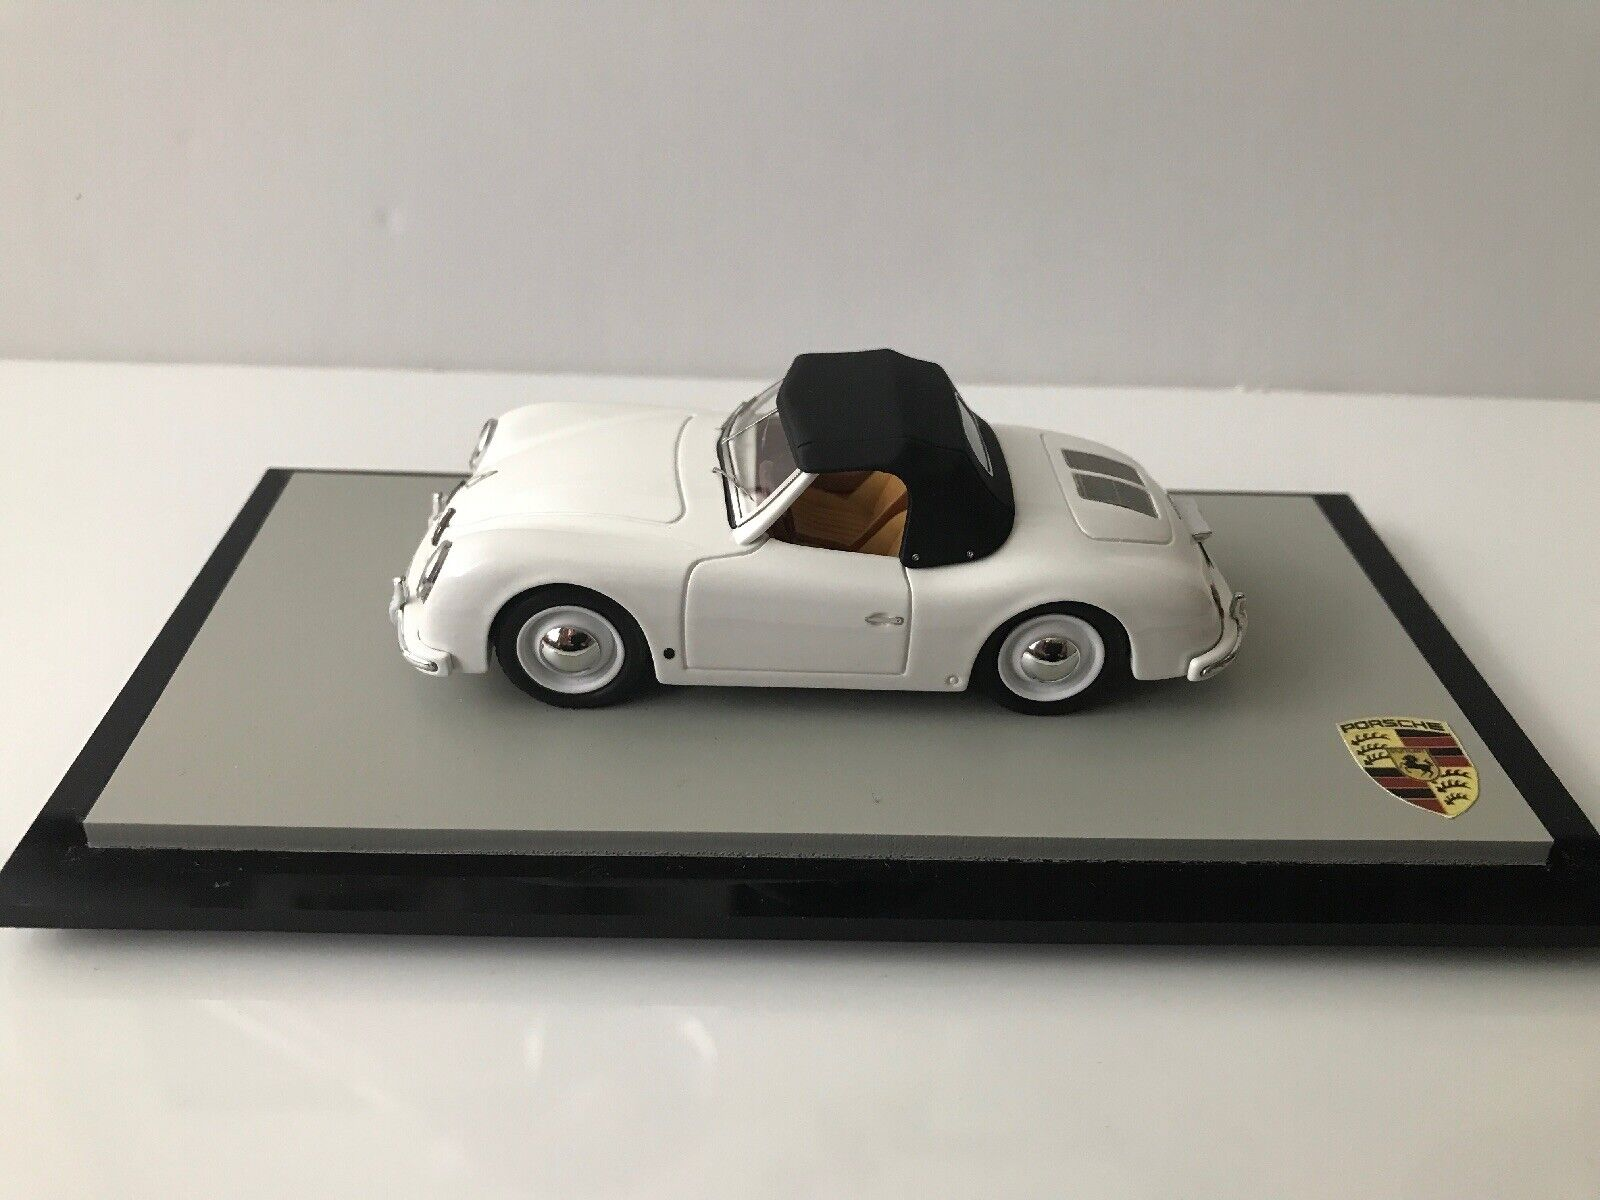 1 43 Scale Resin Model 1952 Porsche 356 America Roadster